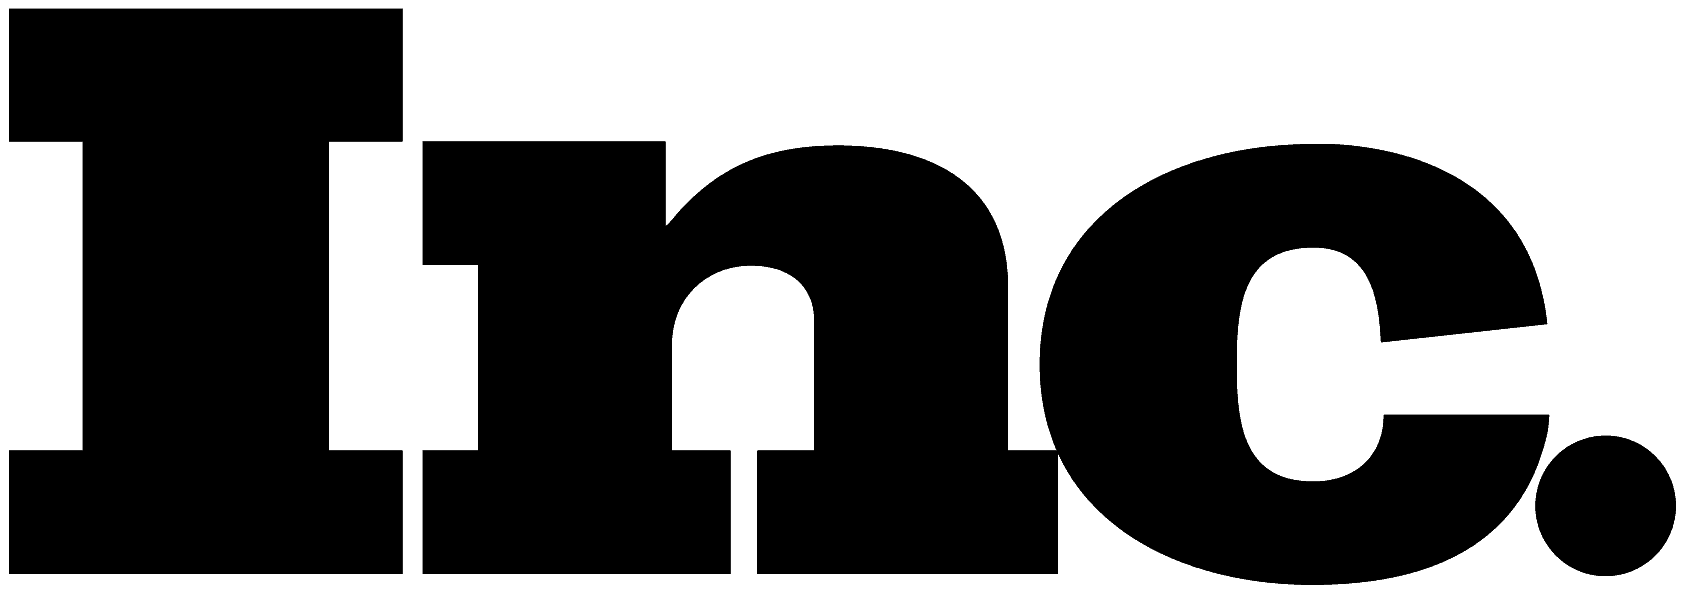 https://mk0bossmomg0l9kpoexa.kinstacdn.com/wp-content/uploads/2019/01/Inc-Magazine-Logo.png